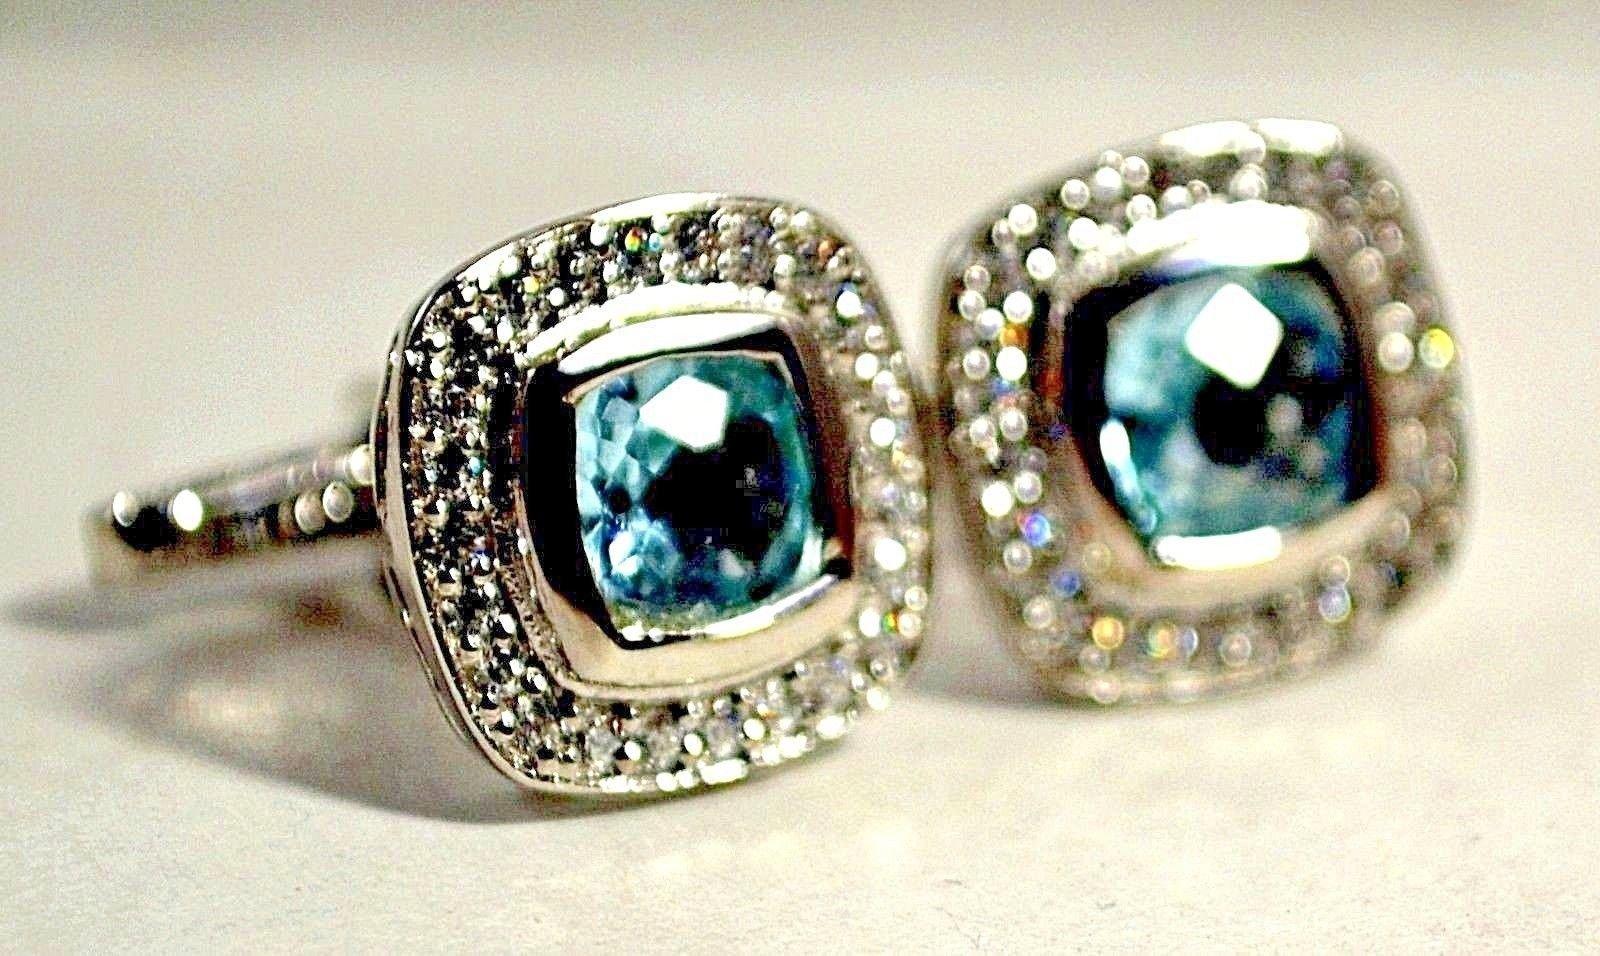 925 Sterling Silver Natural A+ Quality Blue Topaz And Cz Gemstone Artistic Handm